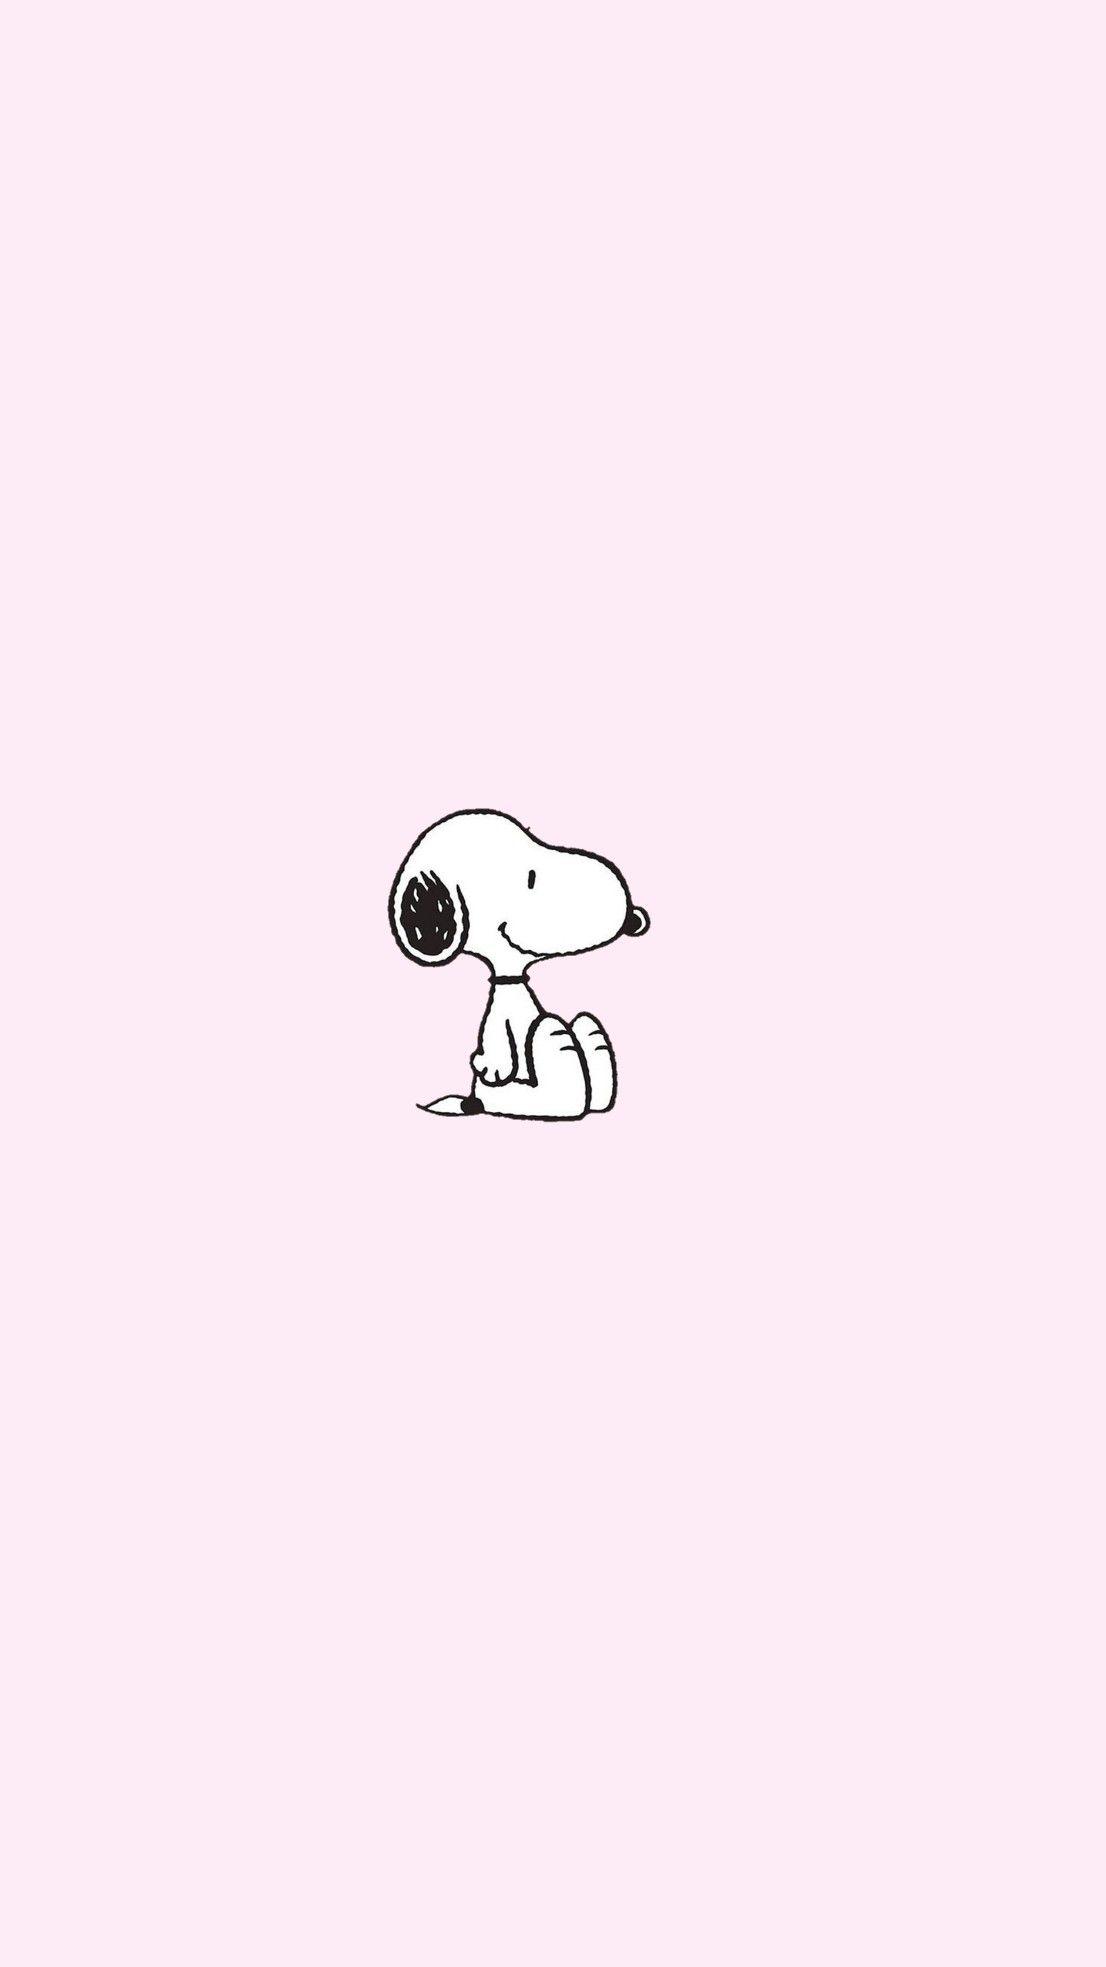 Snoopy Wallpaper O T H E R In 2019 Iphone Wallpaper